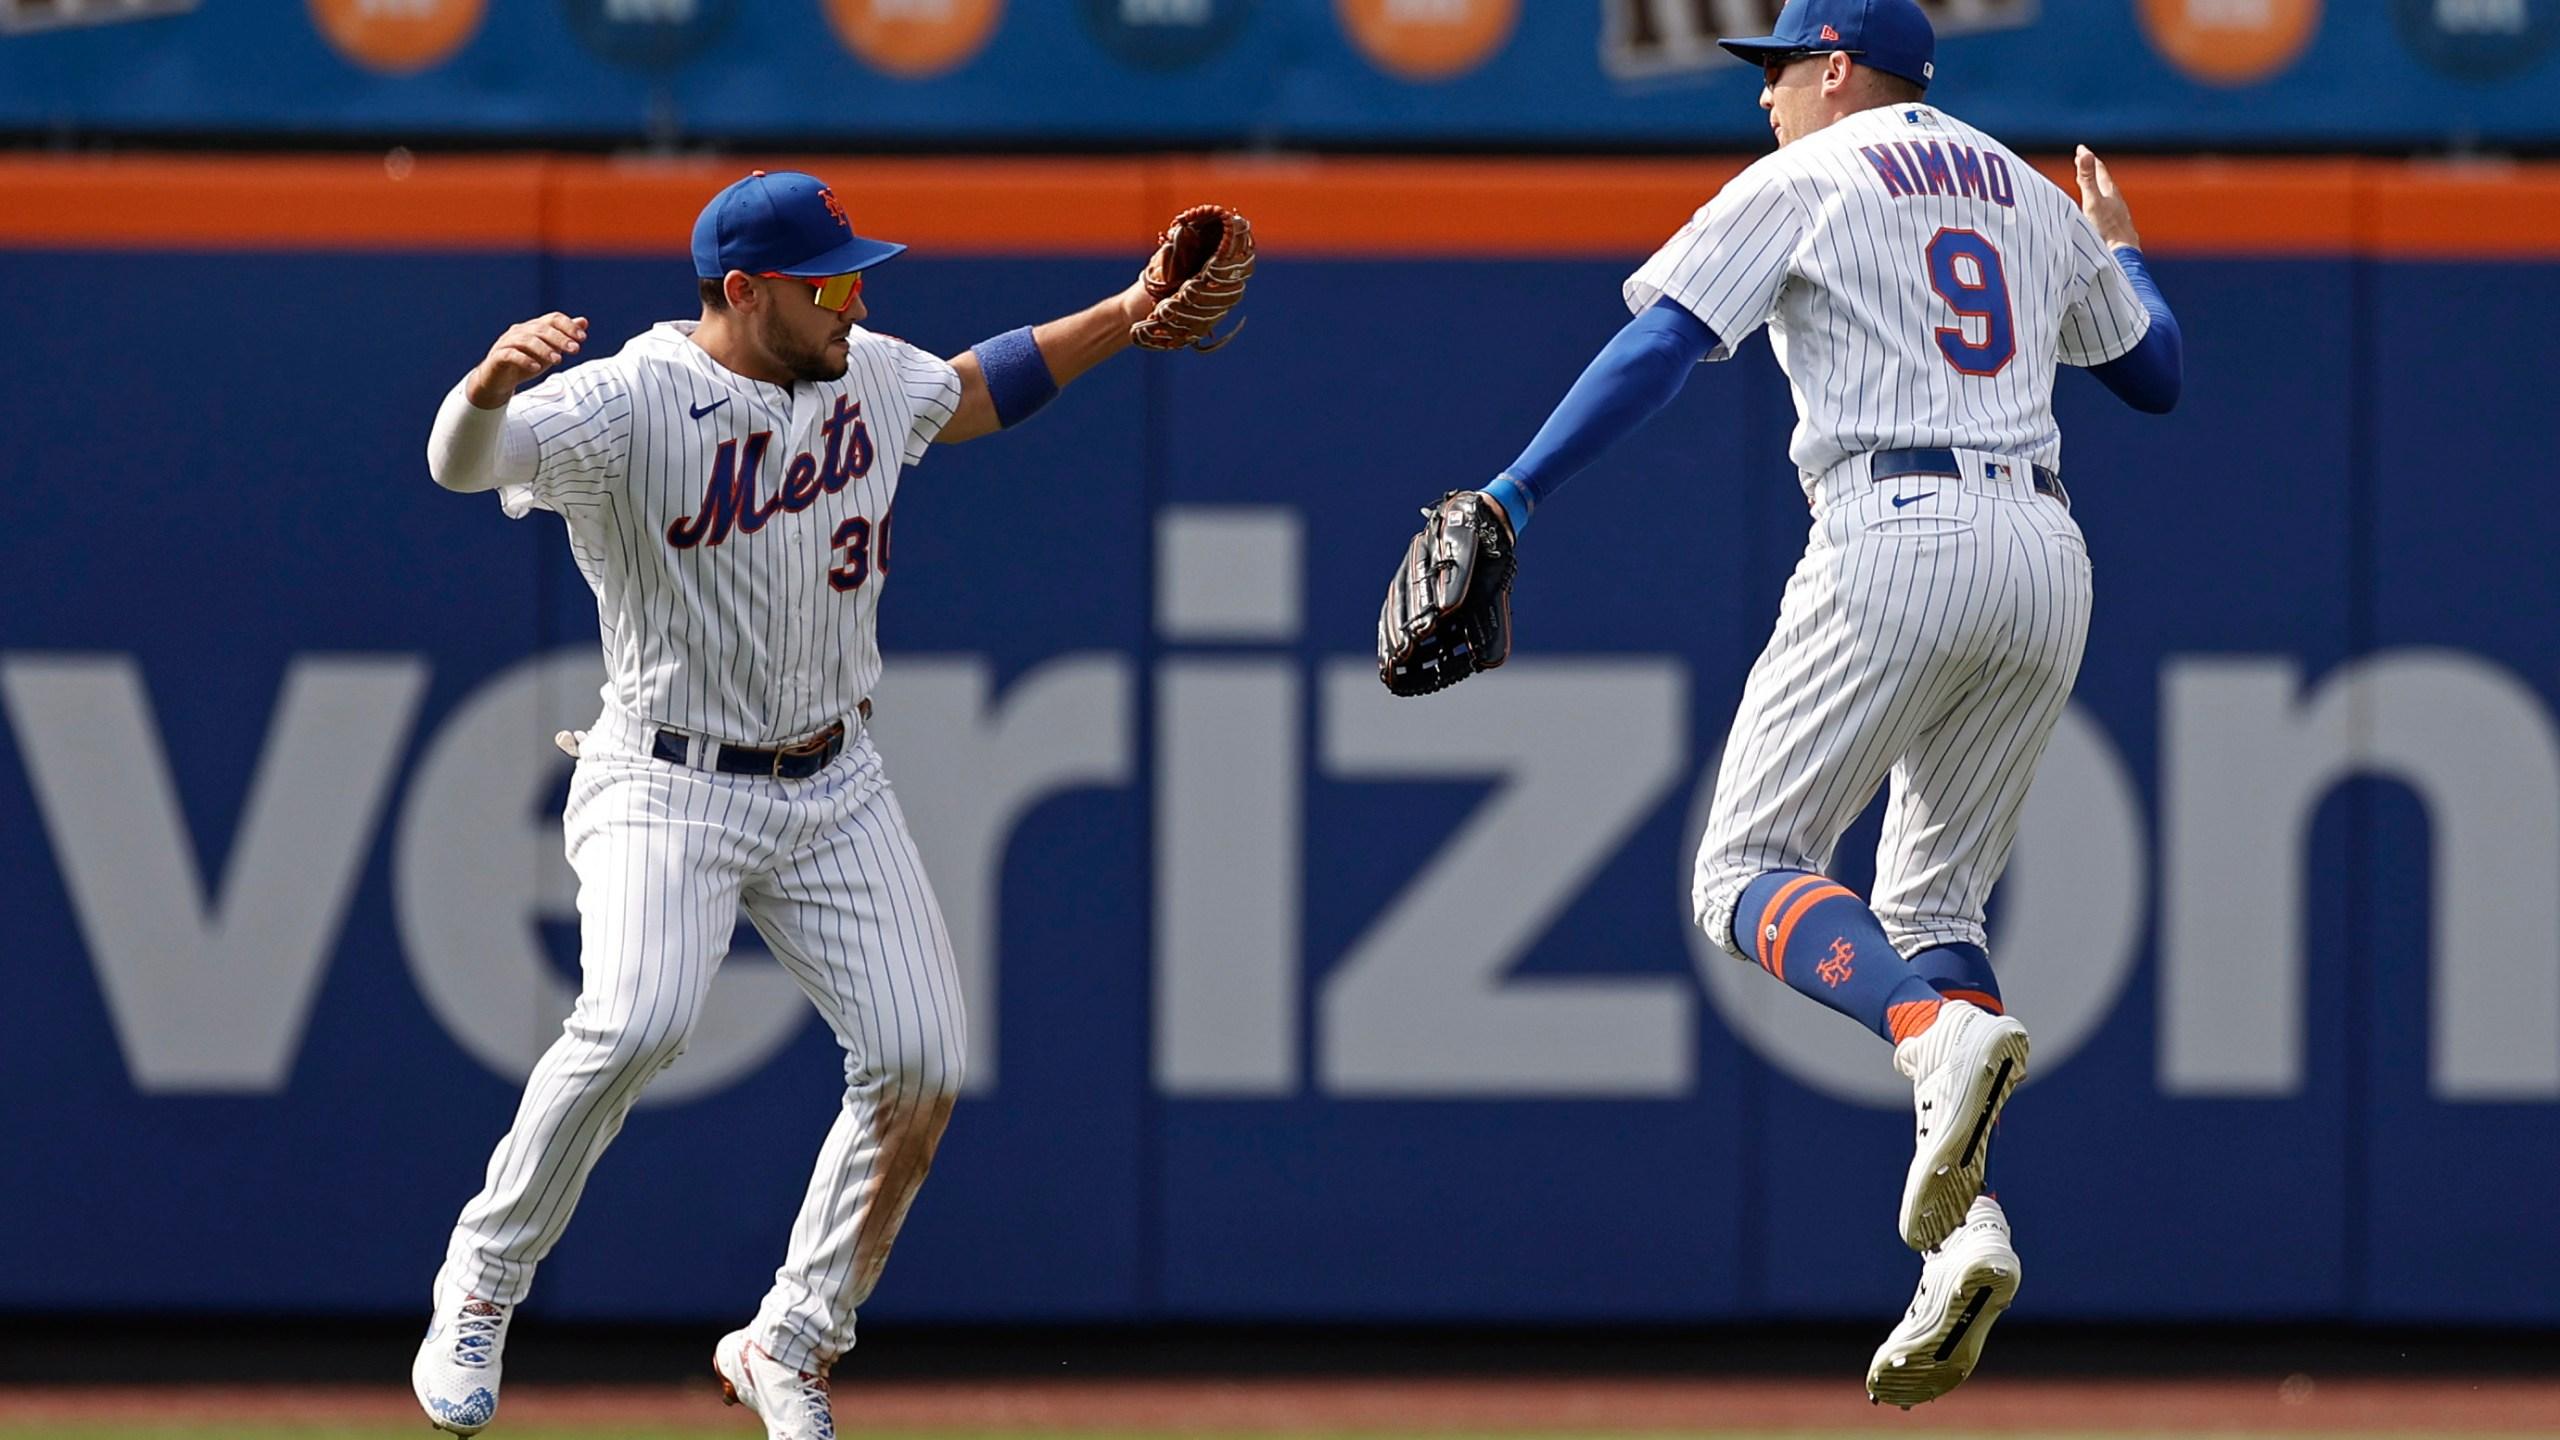 New York Mets right fielder Michael Conforto and center fielder Brandon Nimmo